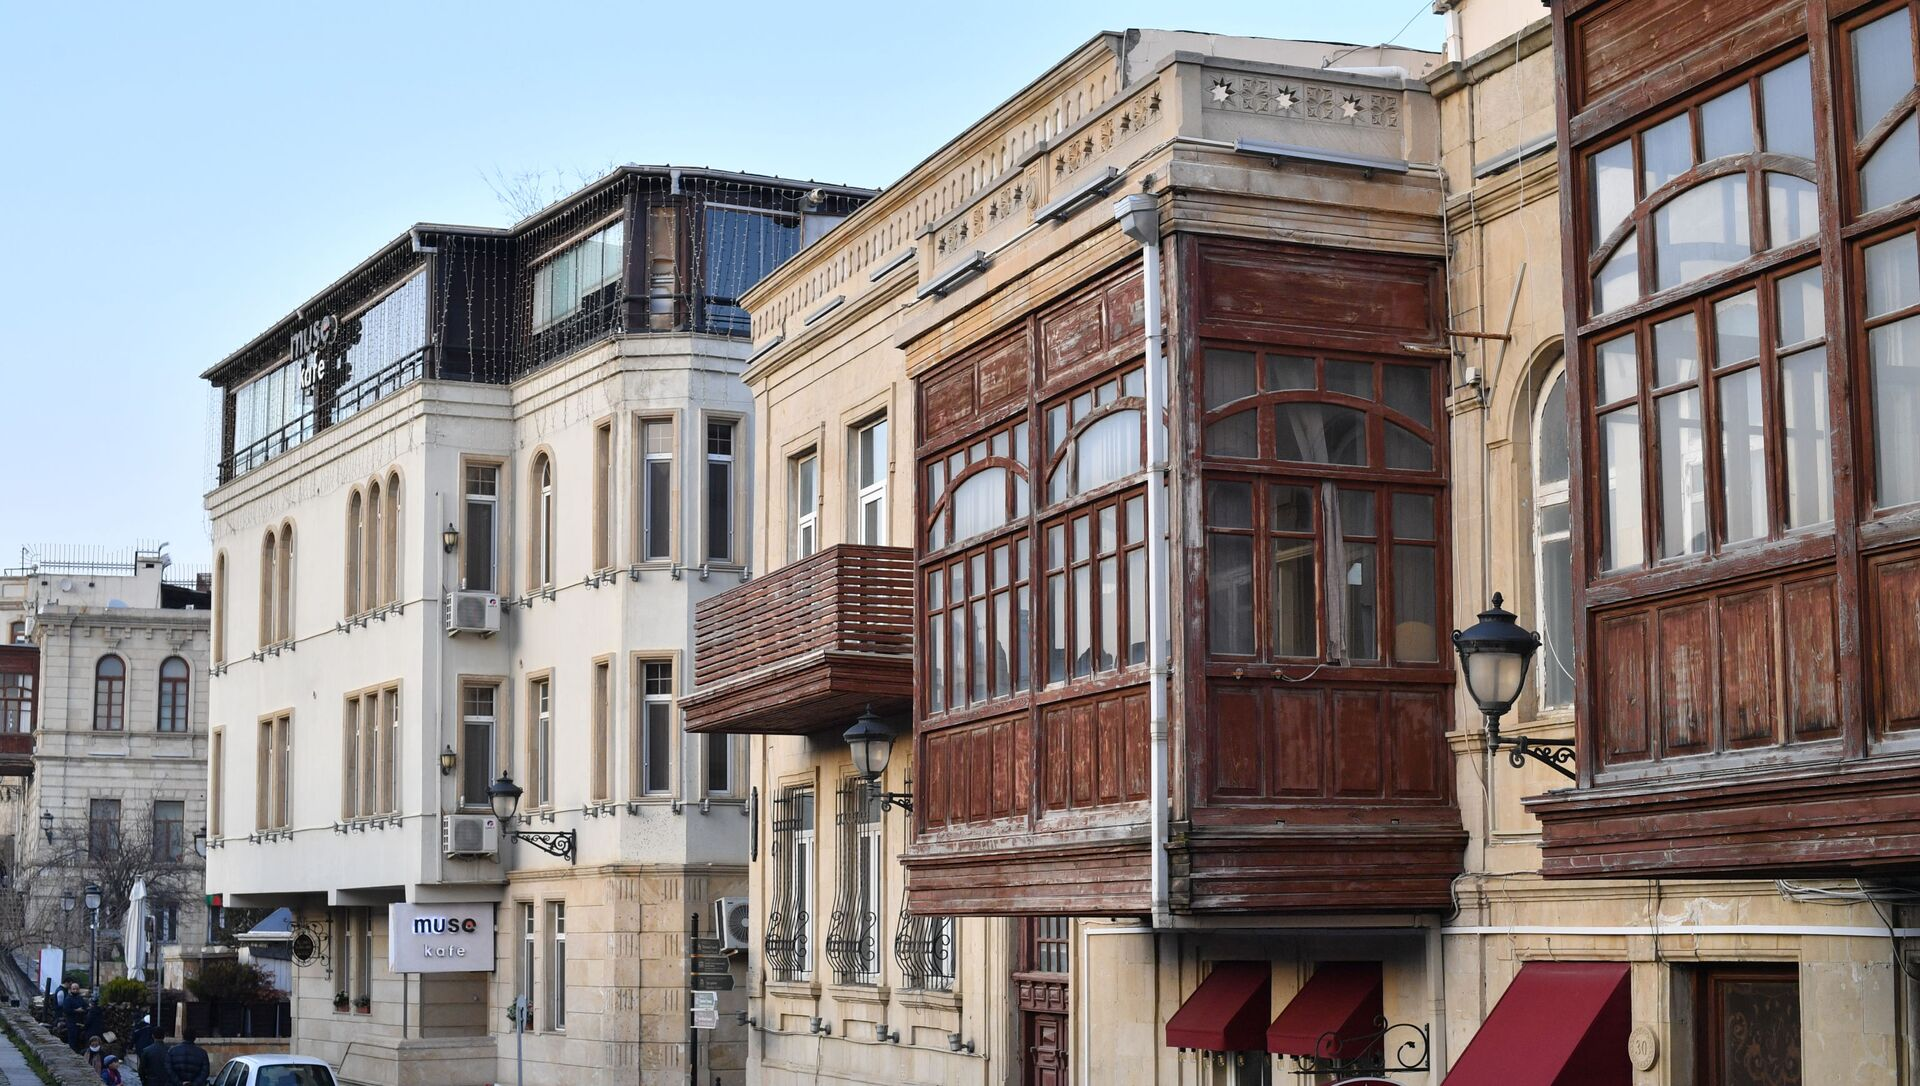 Одна из улиц в Баку. - Sputnik Azərbaycan, 1920, 20.09.2021